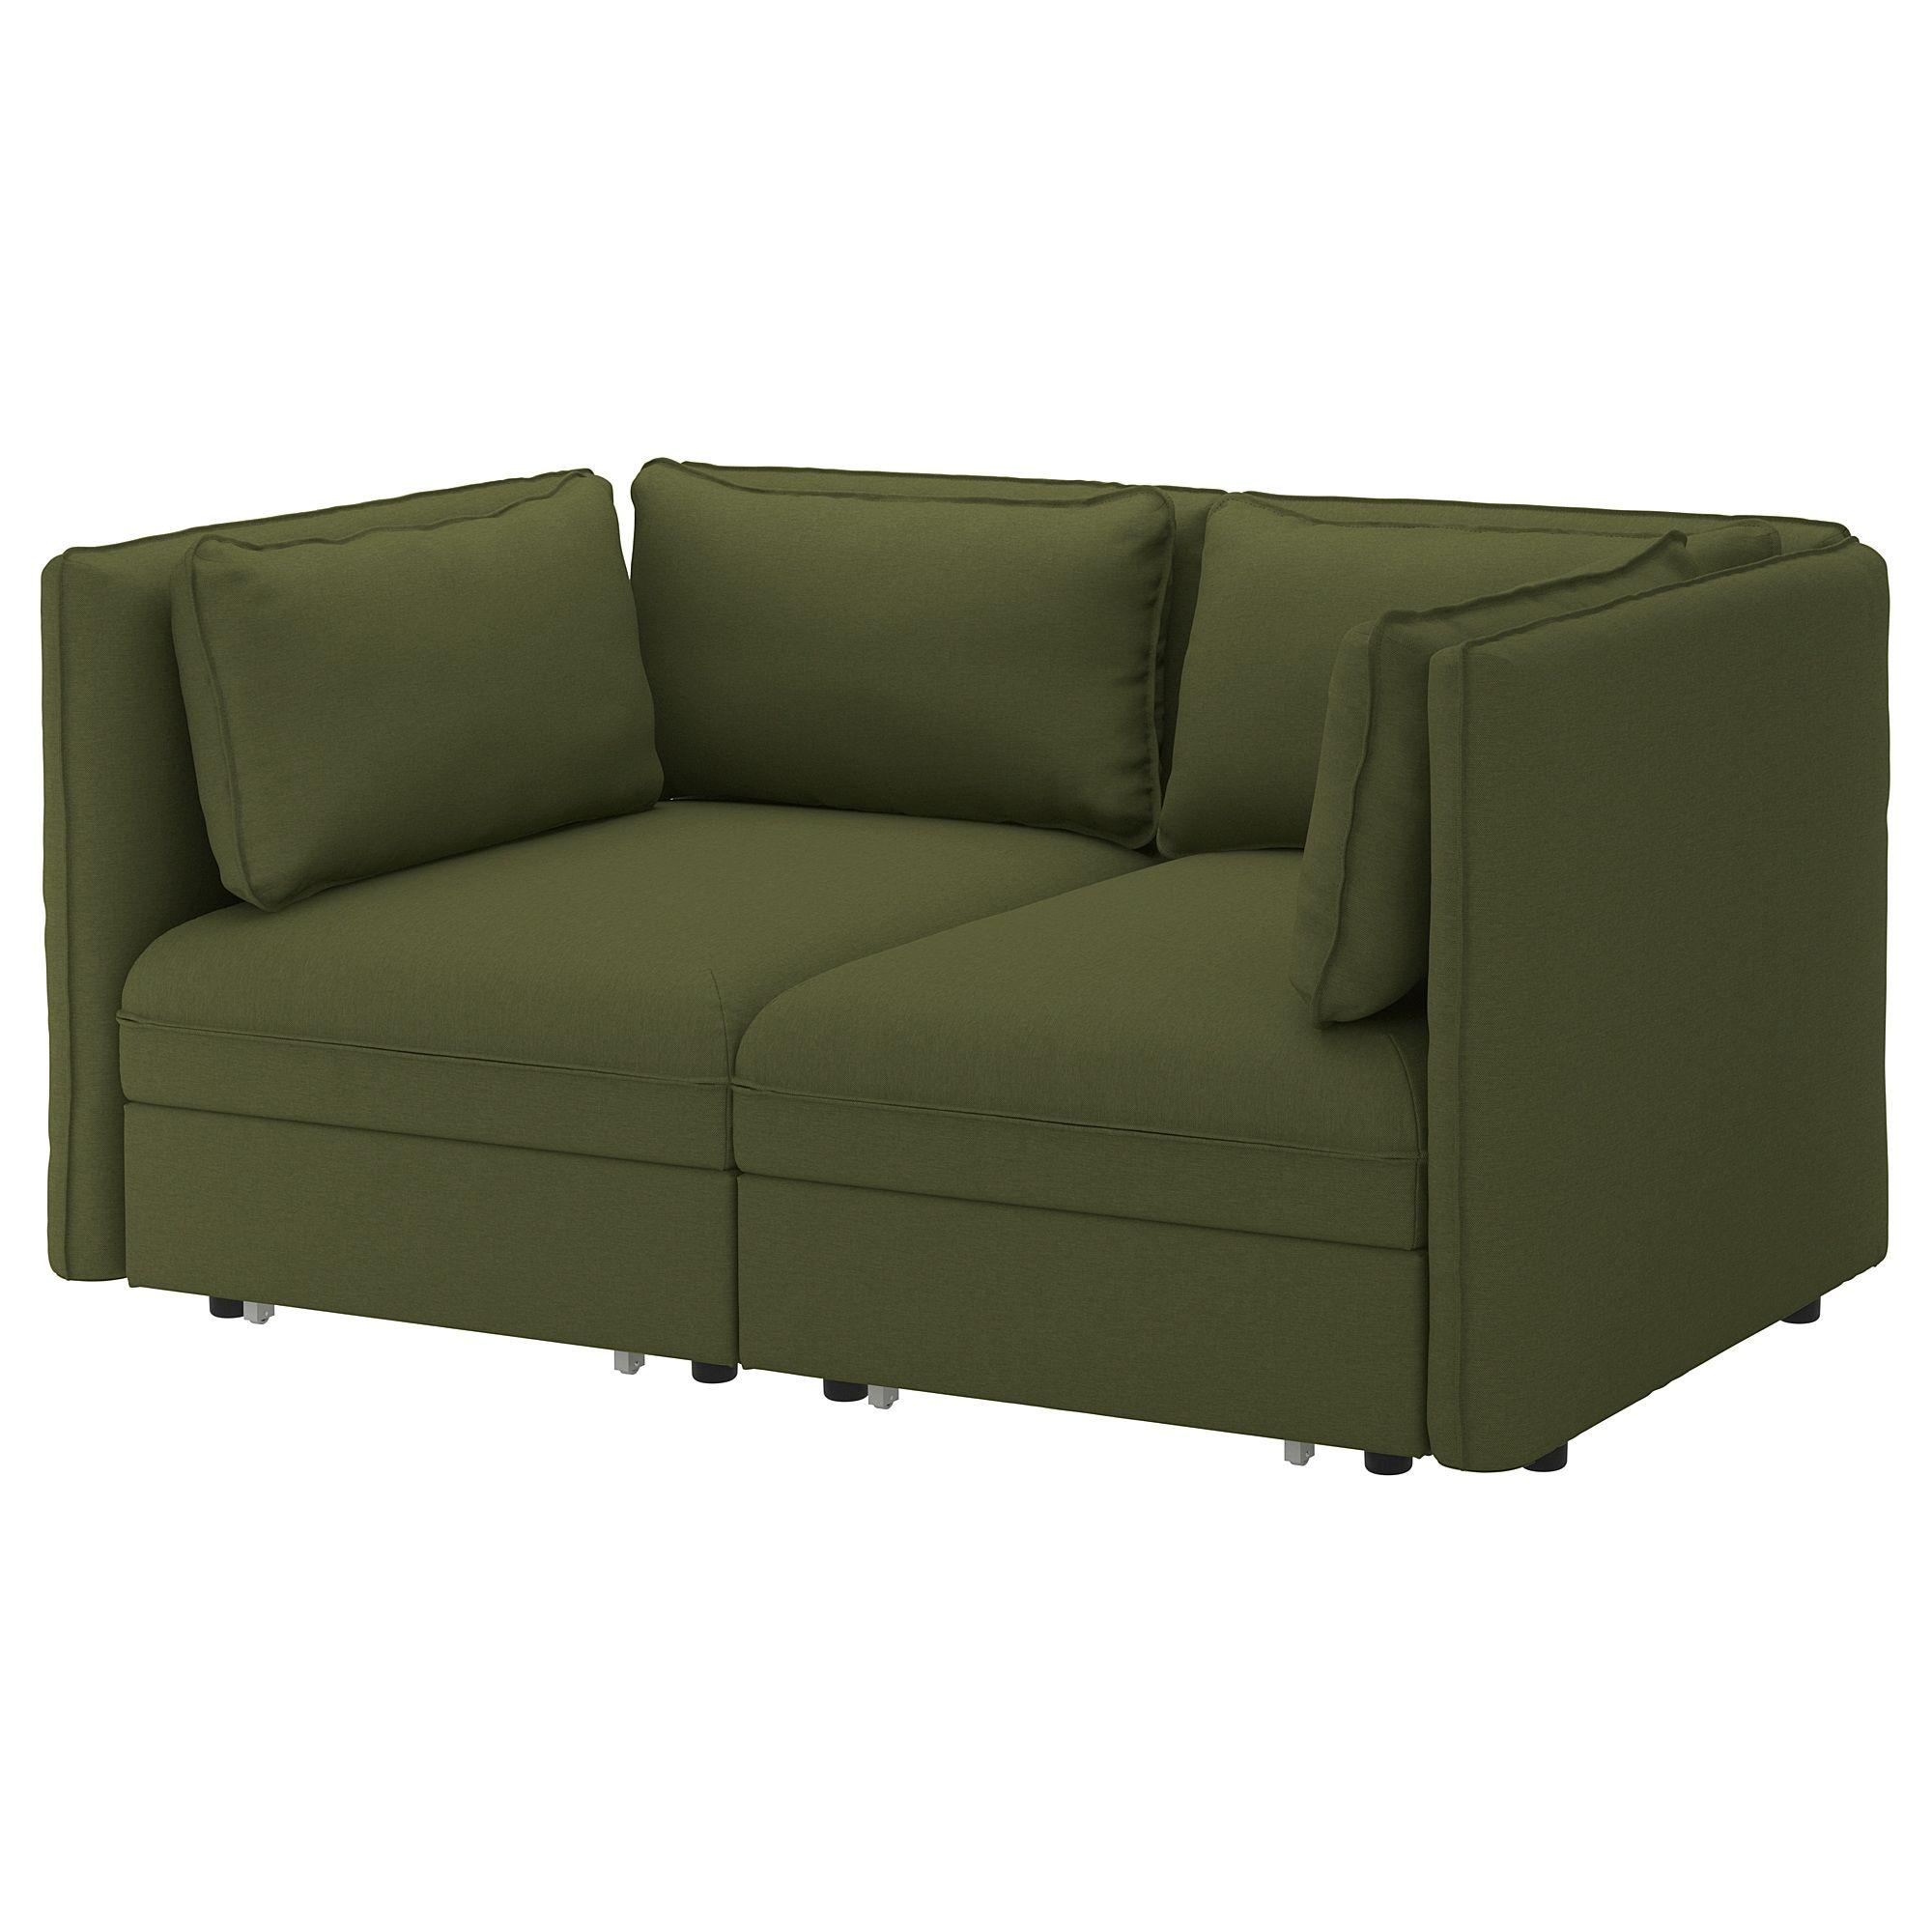 Vallentuna Mod Sofa 2 Seat W 2 Slpr Sections Orrsta Olive Green In